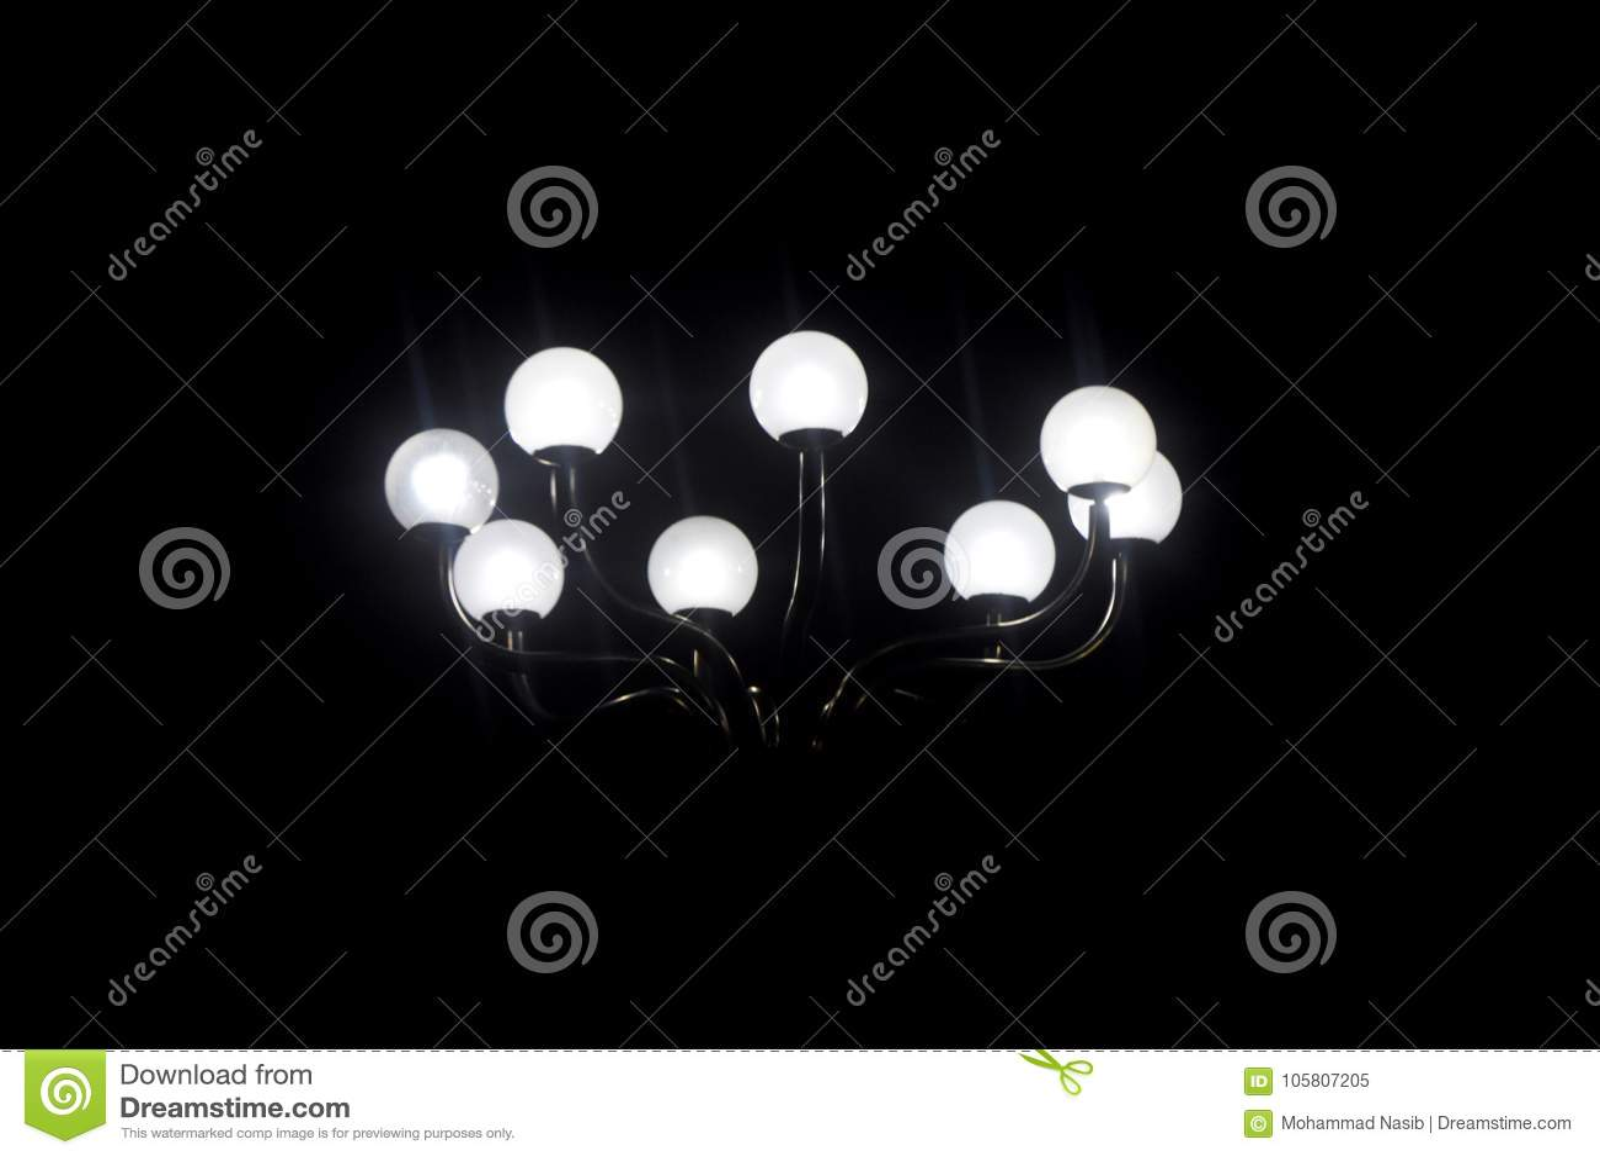 Street Lights White Dark Background Photograph Stock Image Image Of Street Night 105807205